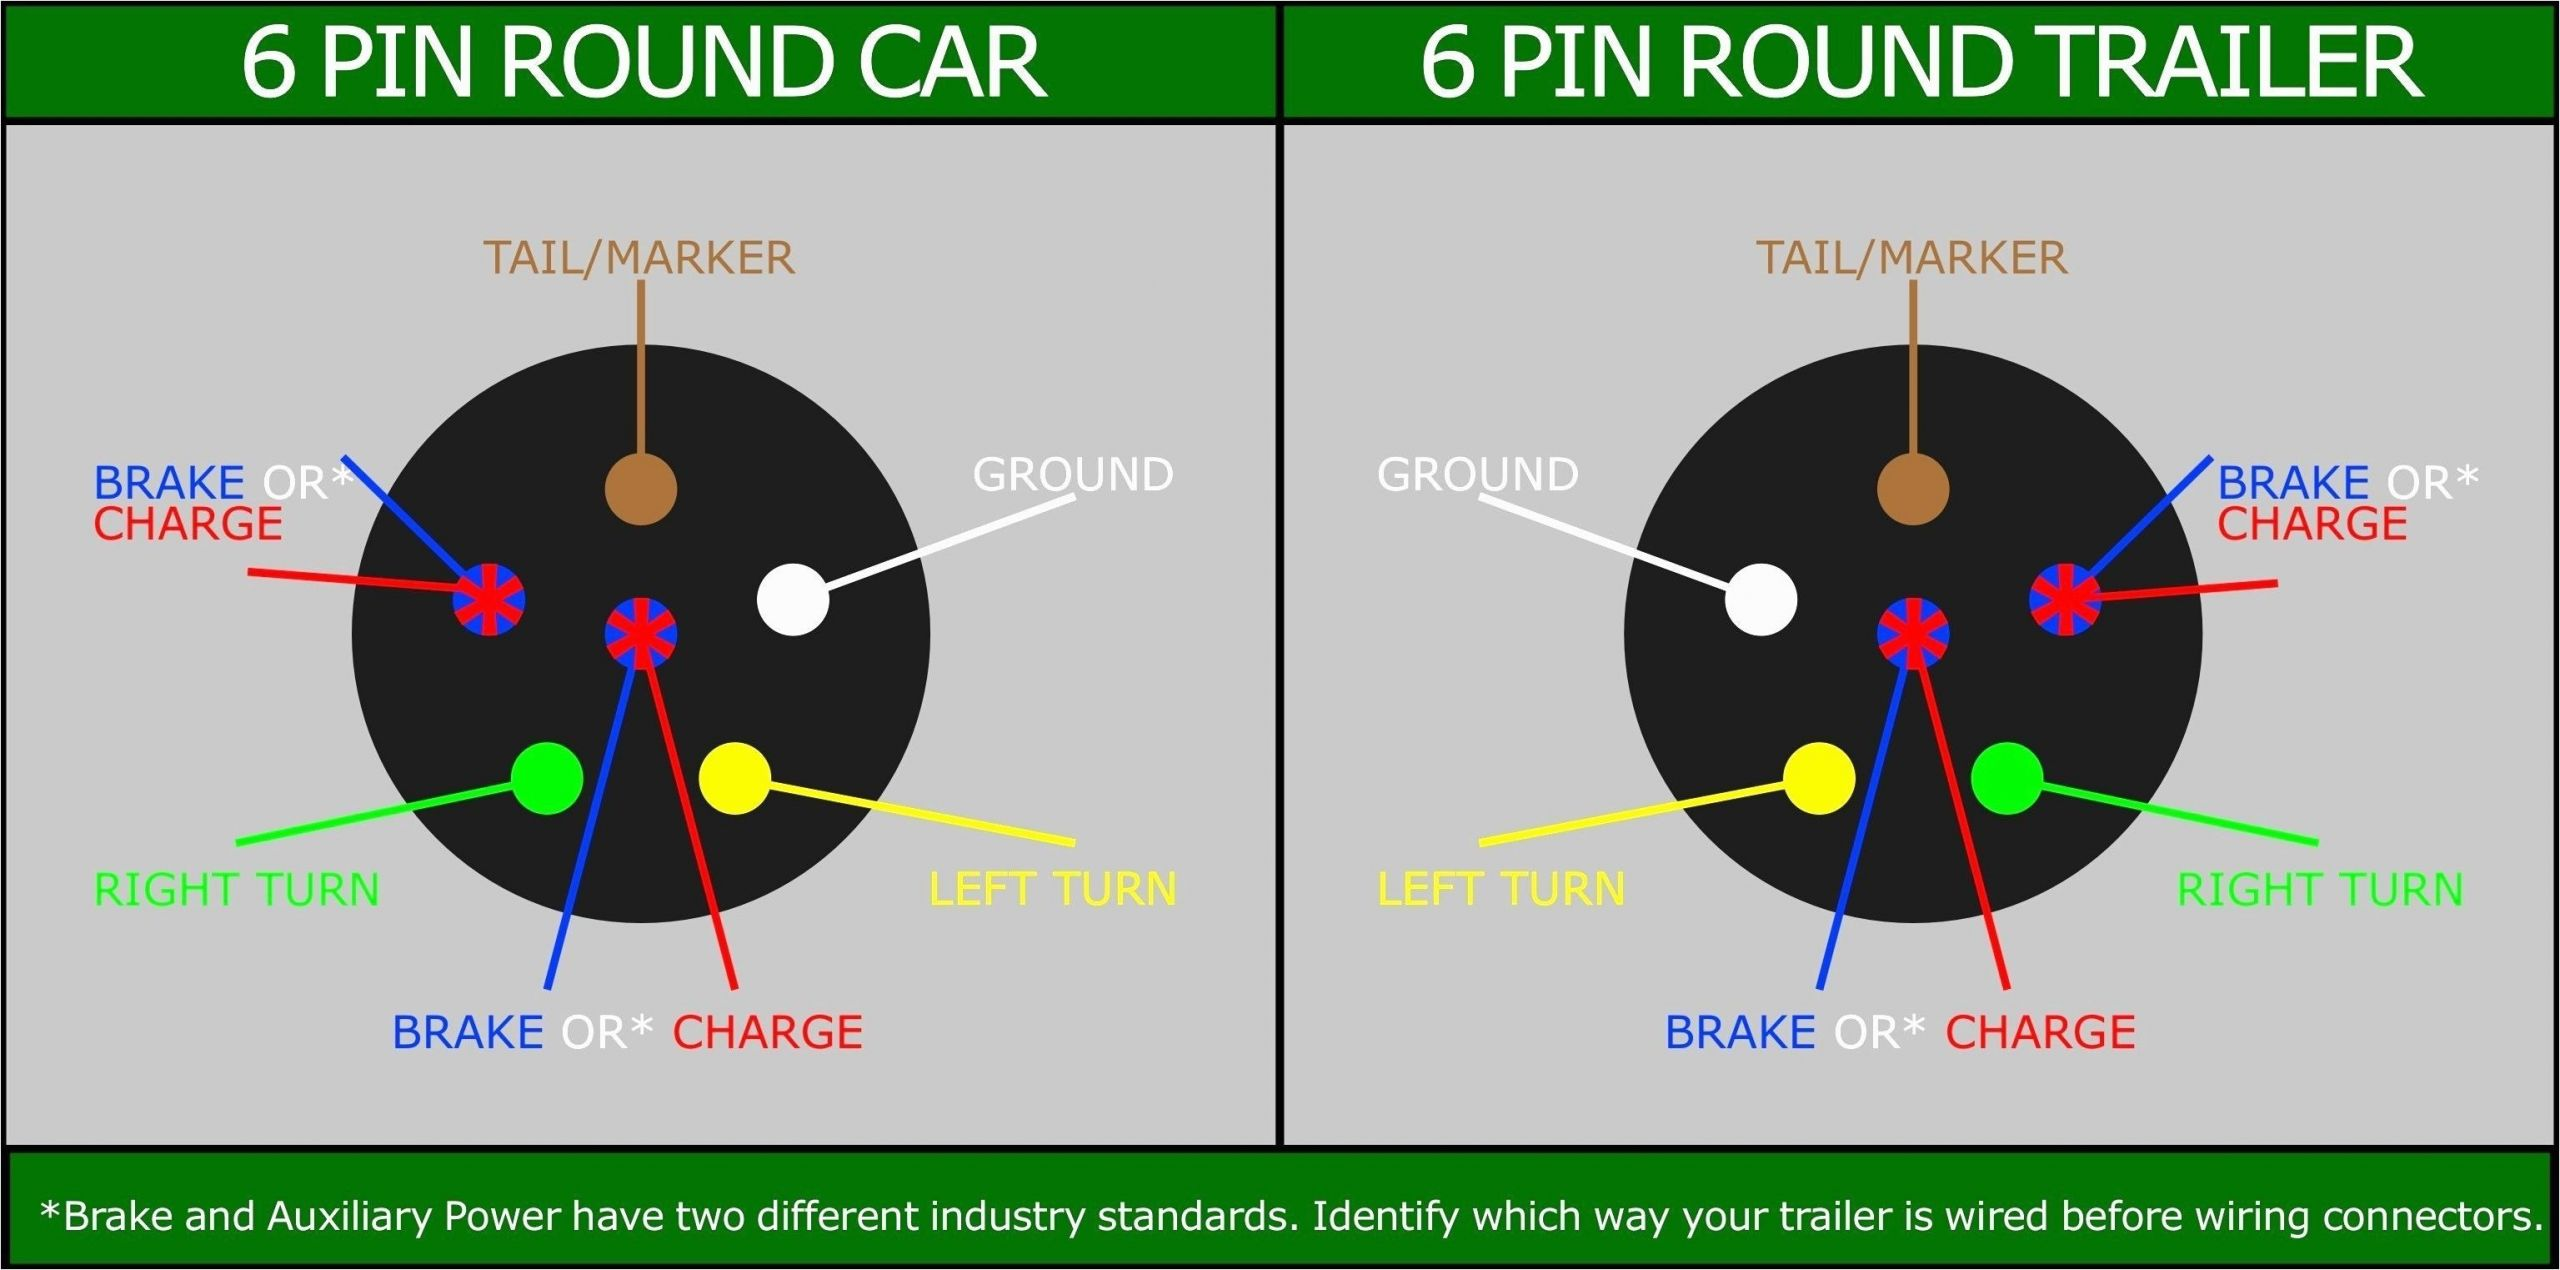 6 Way Round Trailer Plug Wiring Diagram New Wiring Diagram Car Trailer Lights Con Imagenes Casitas